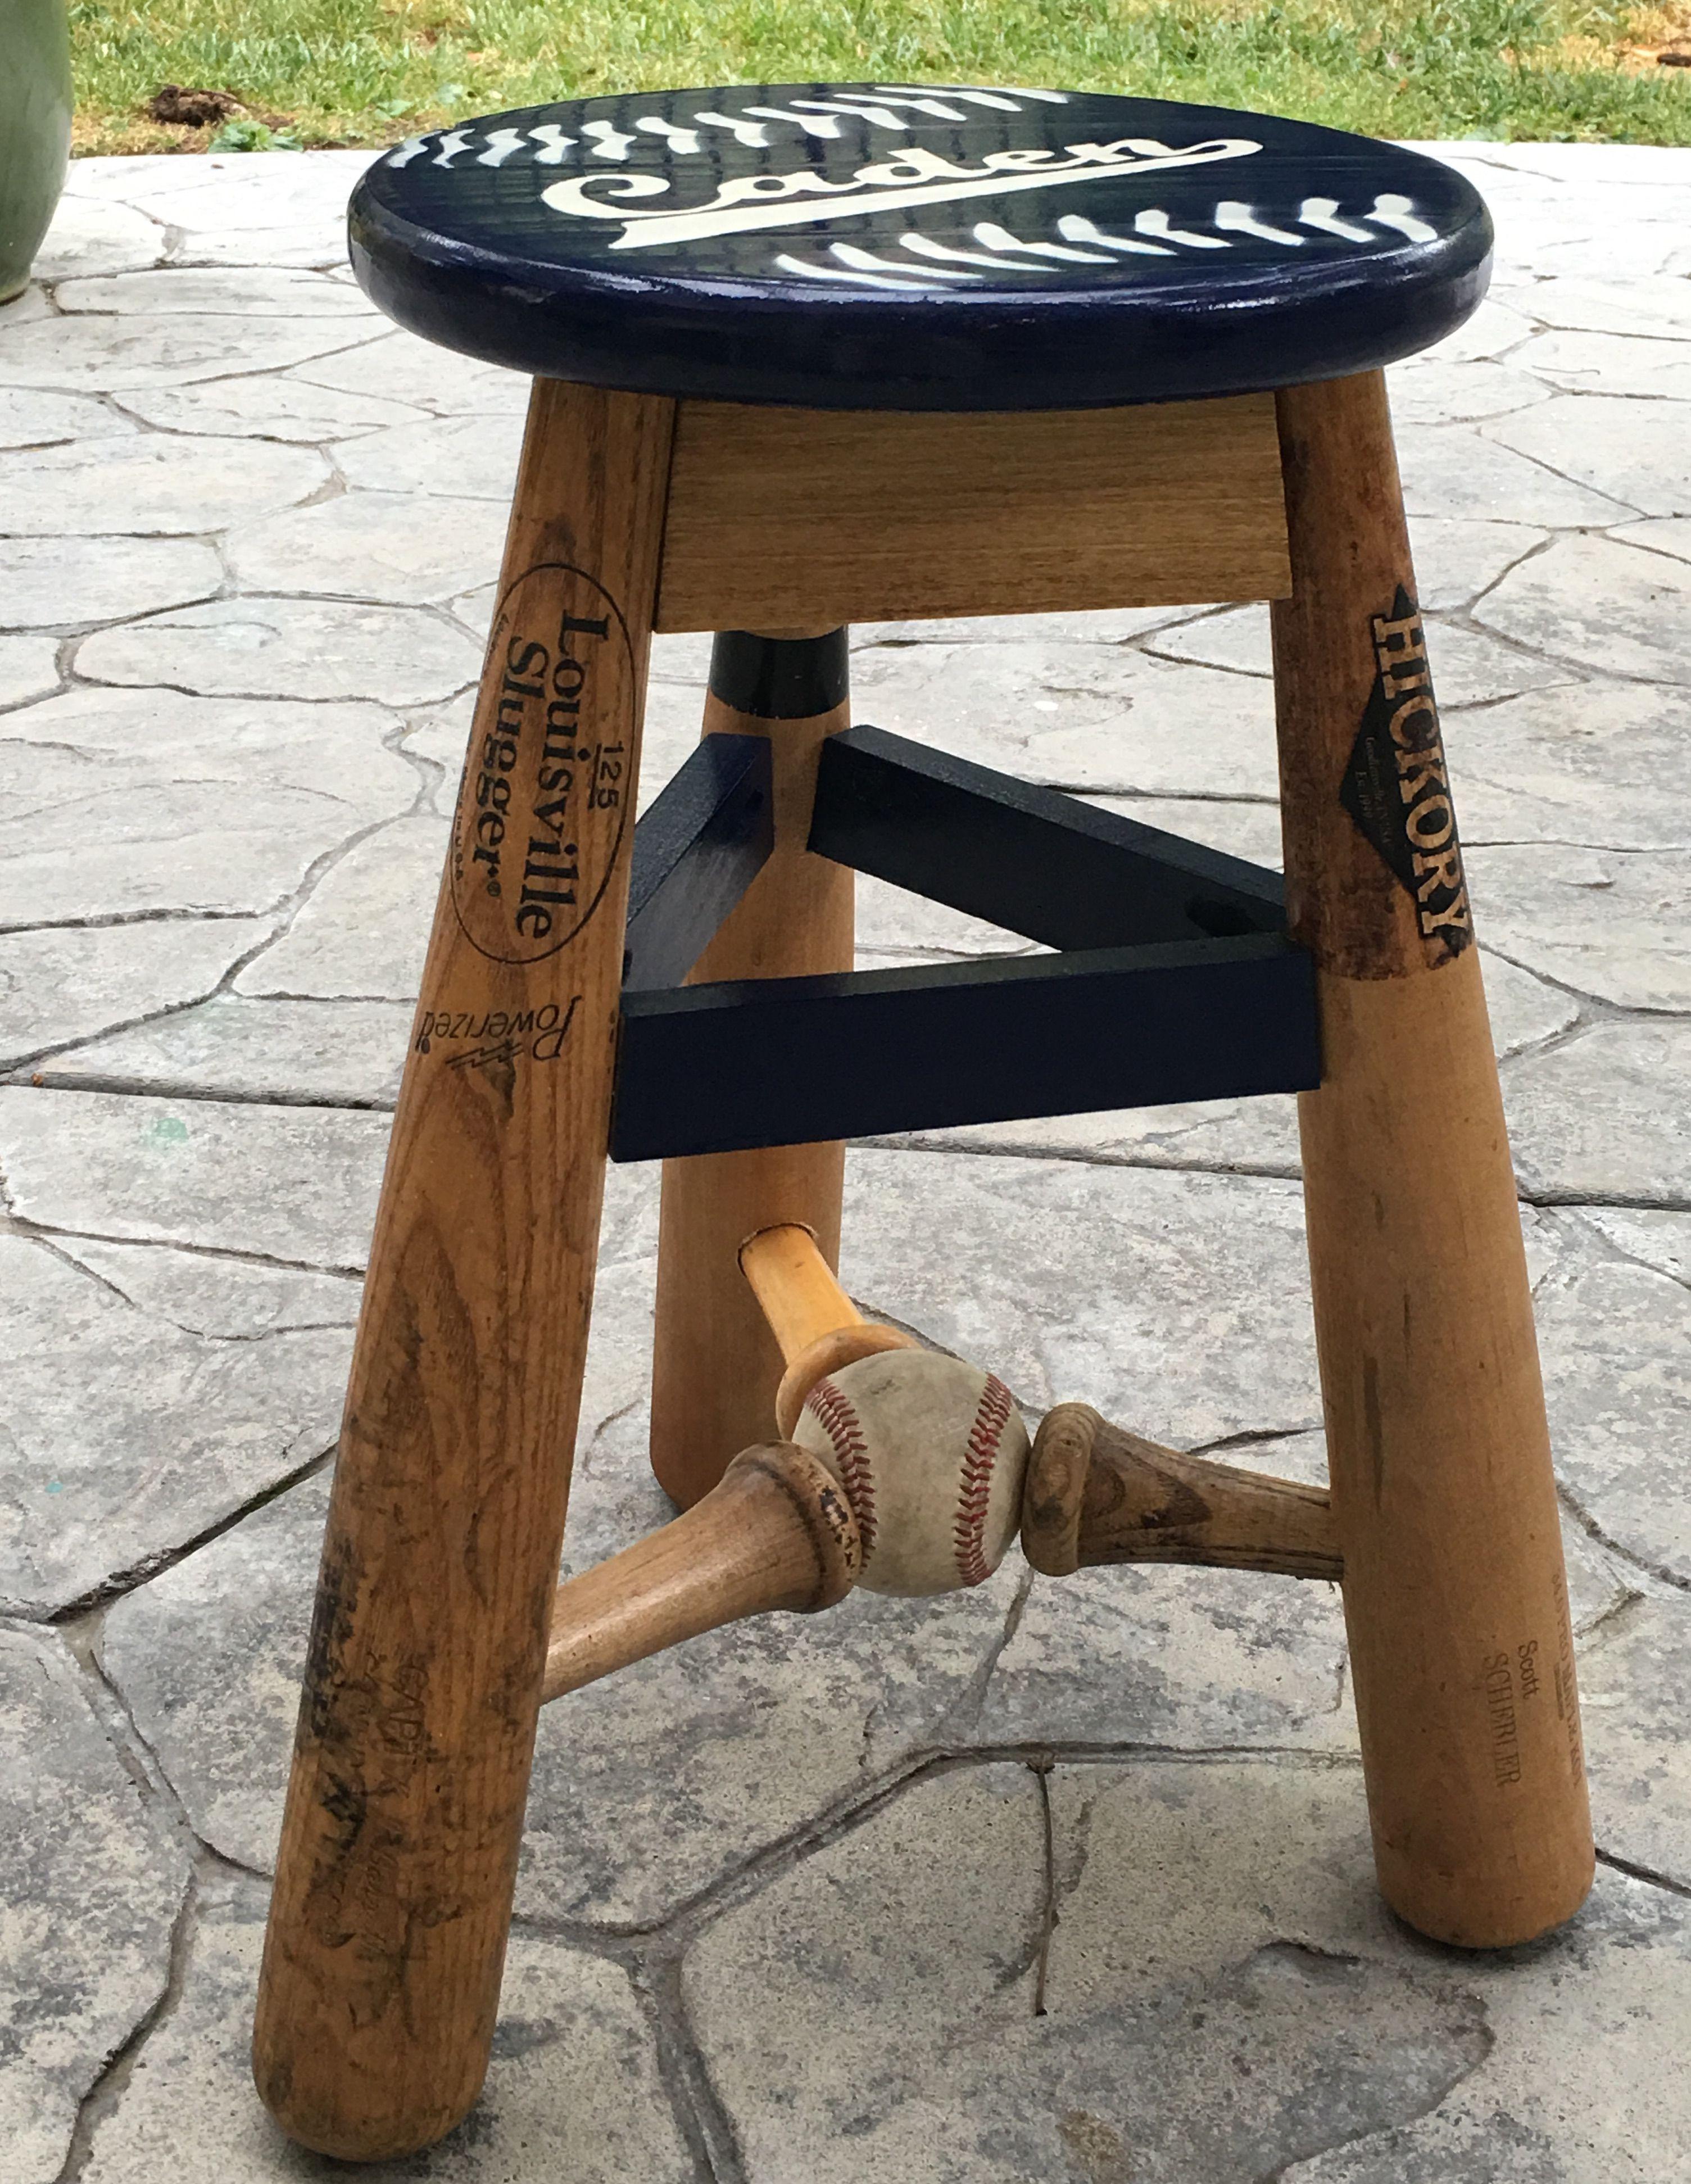 Broken bat three legged stool custom made for a birthday t